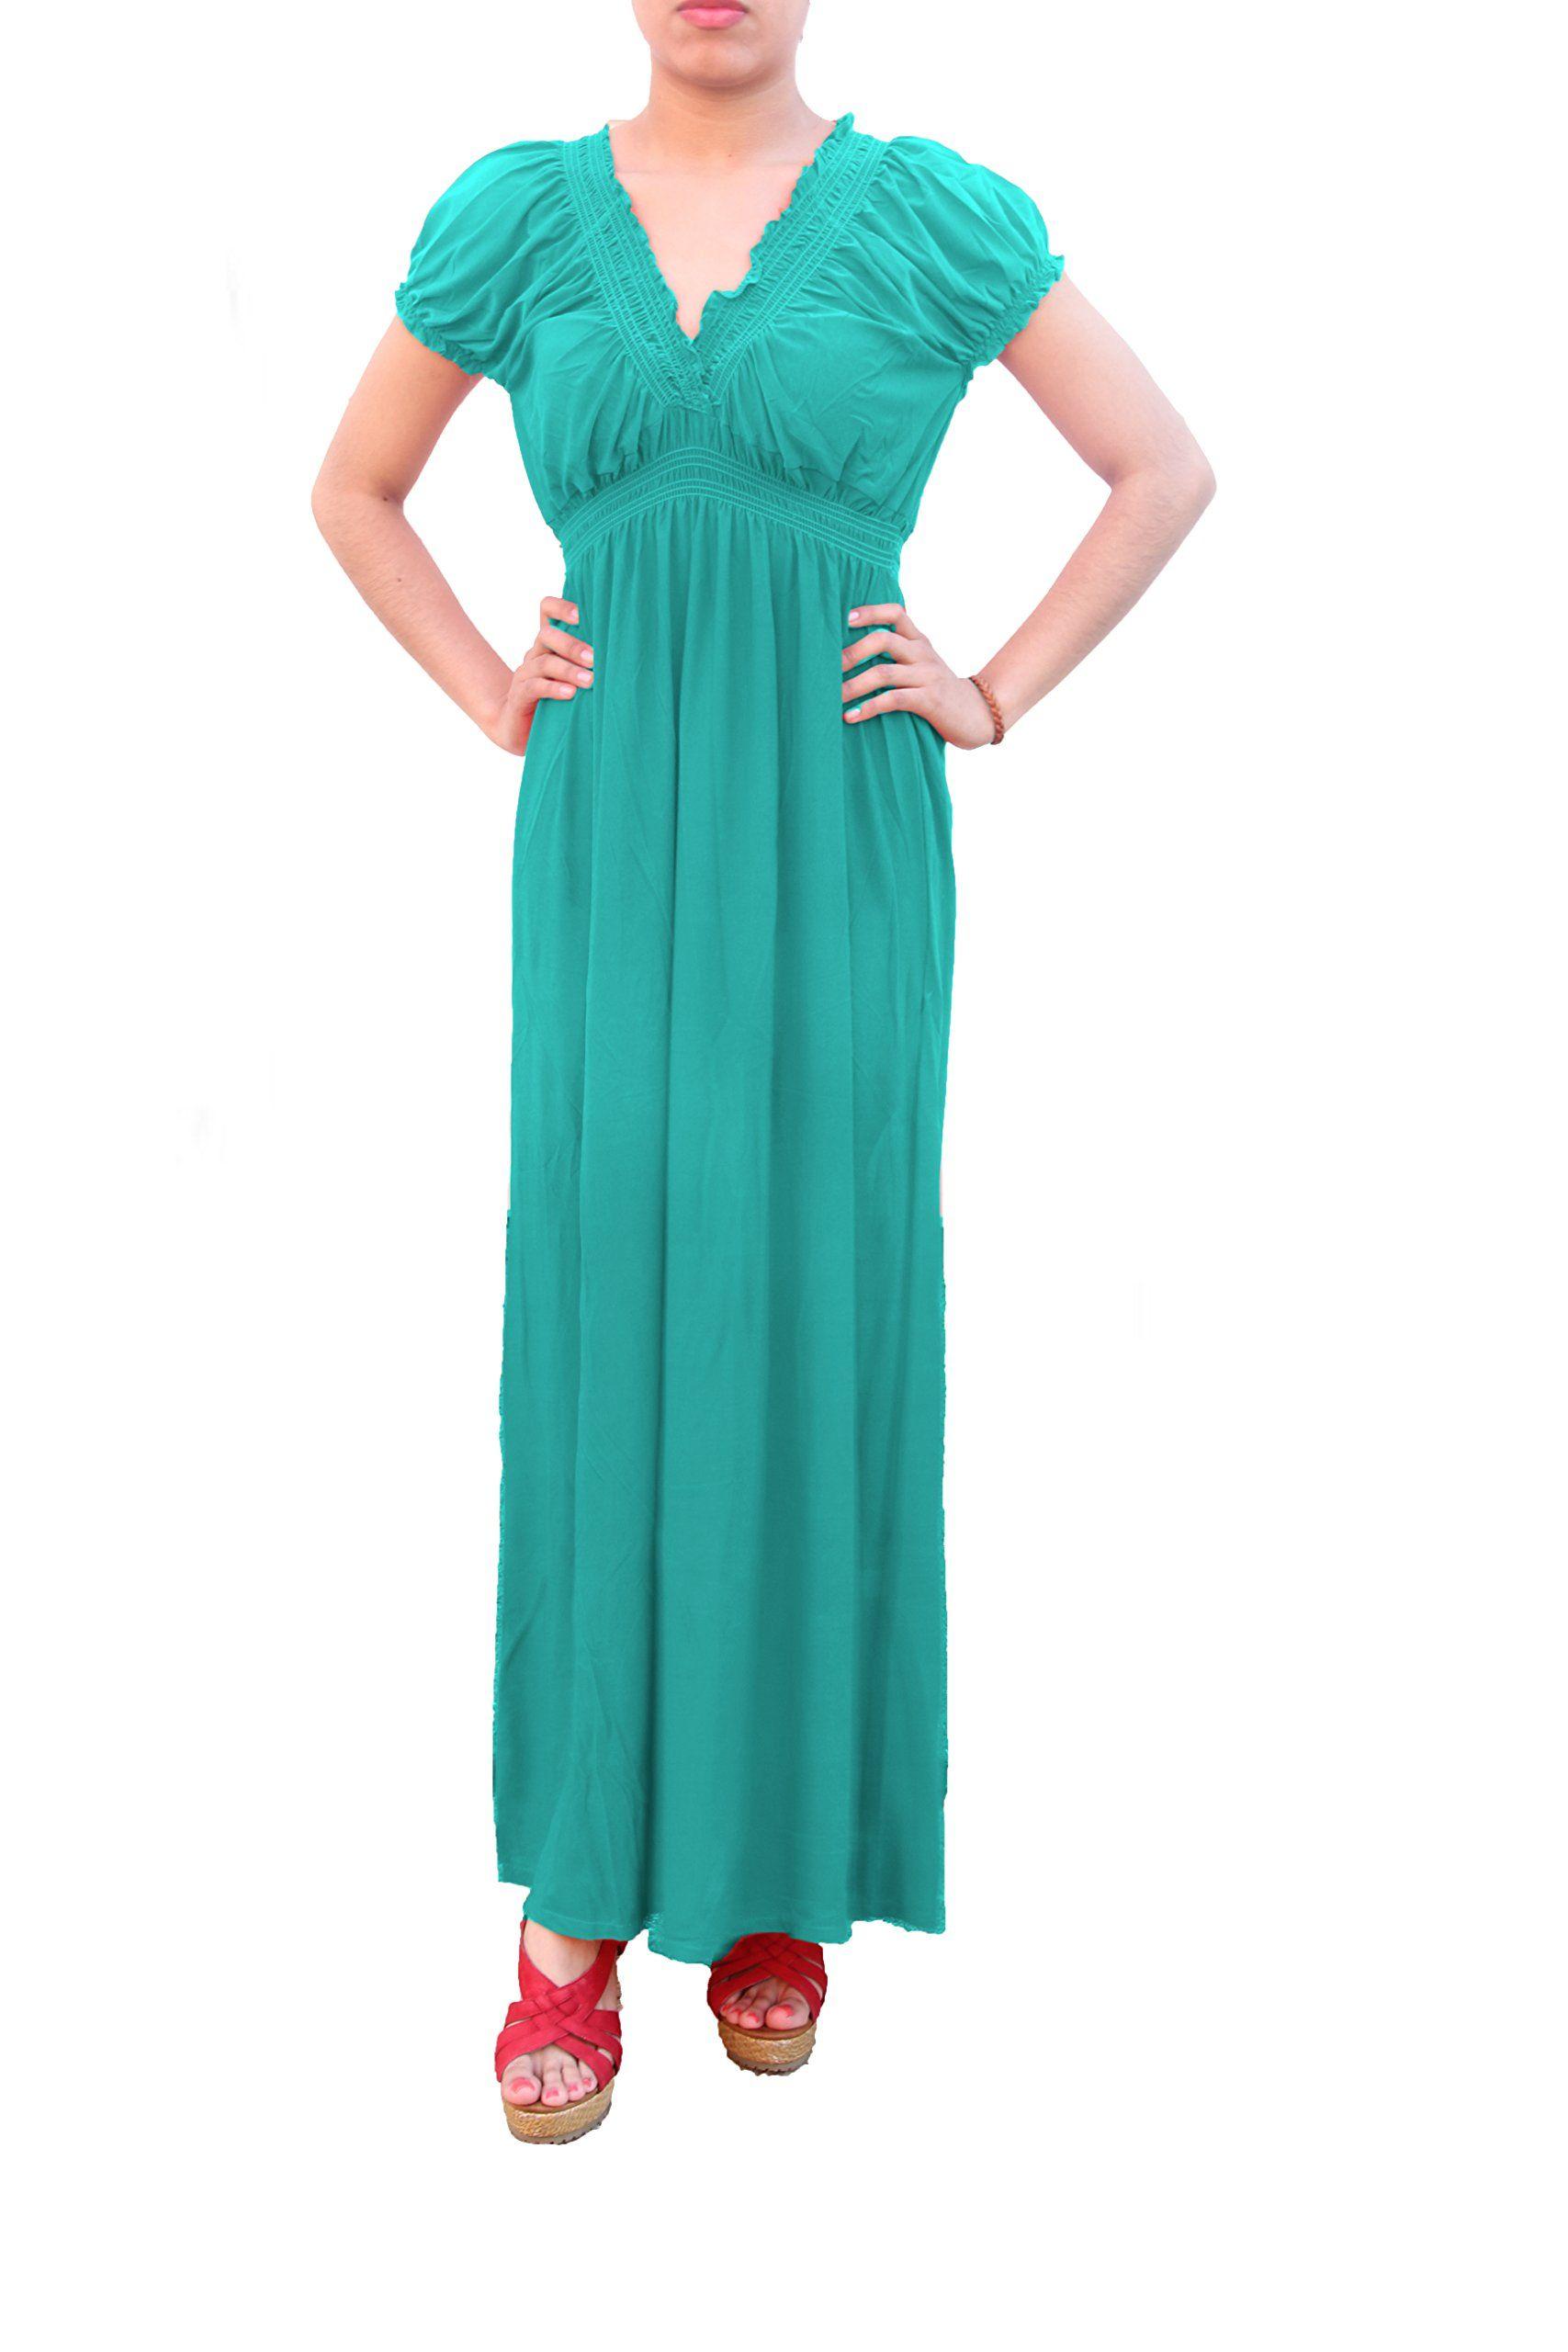 c91fd1aacef Anni Women s Clothing-ladies Deep V-neck Plus Size Sexy Beach Maxi Dress     Unbelievable item right here!   Plus size dresses